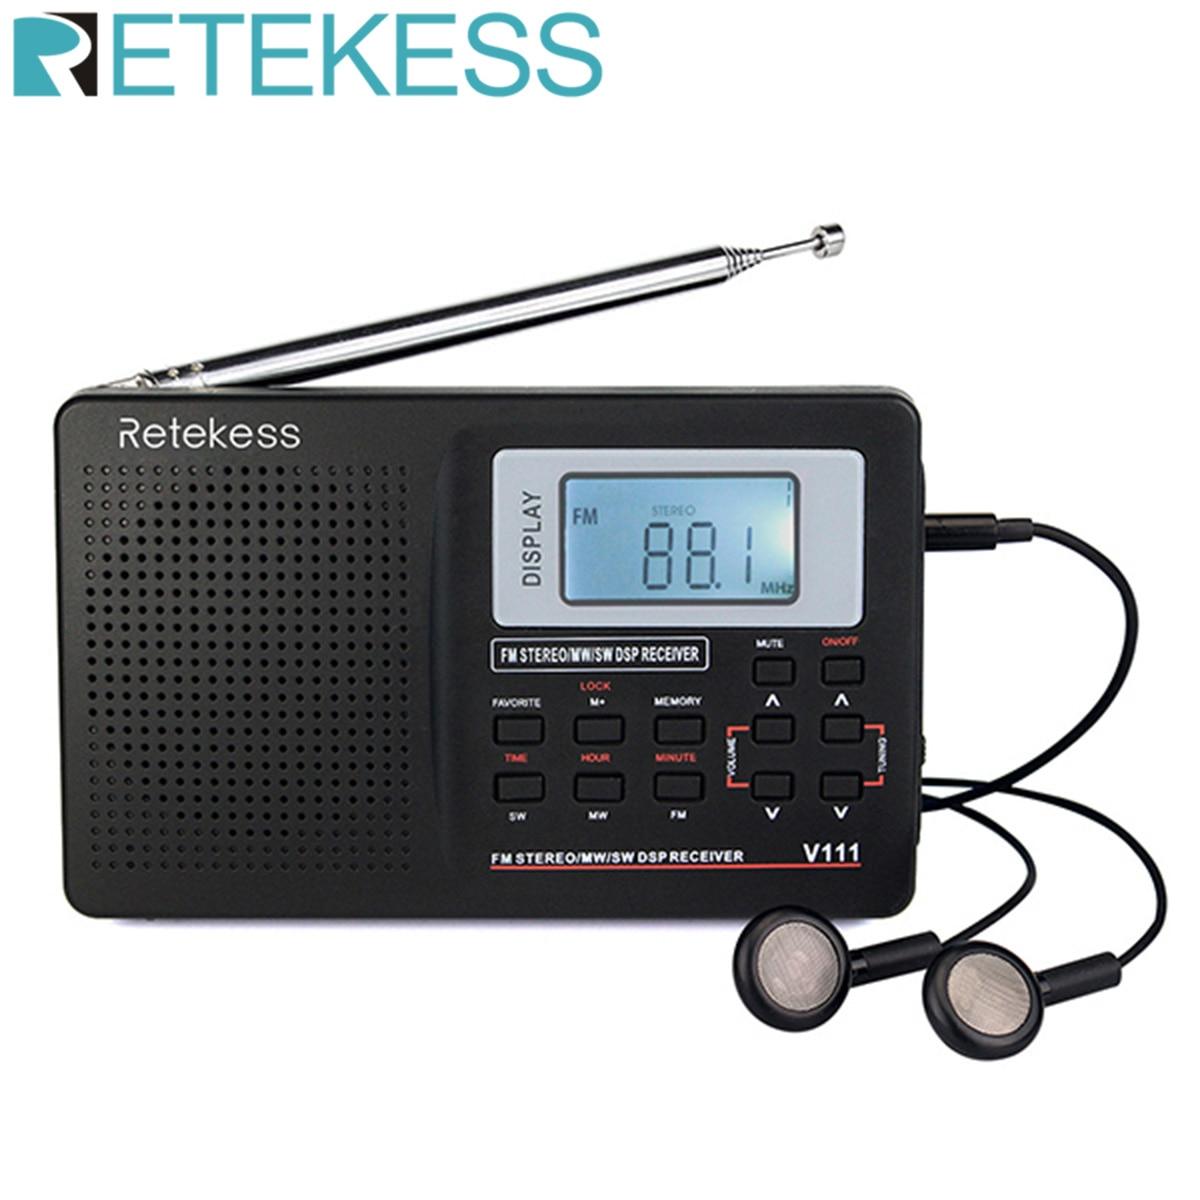 RETEKESS V111 Full Band Radio FM Stereo/MW/SW DSP World Band Receiver with Timing Alarm Clock Portable Radio Black F9201